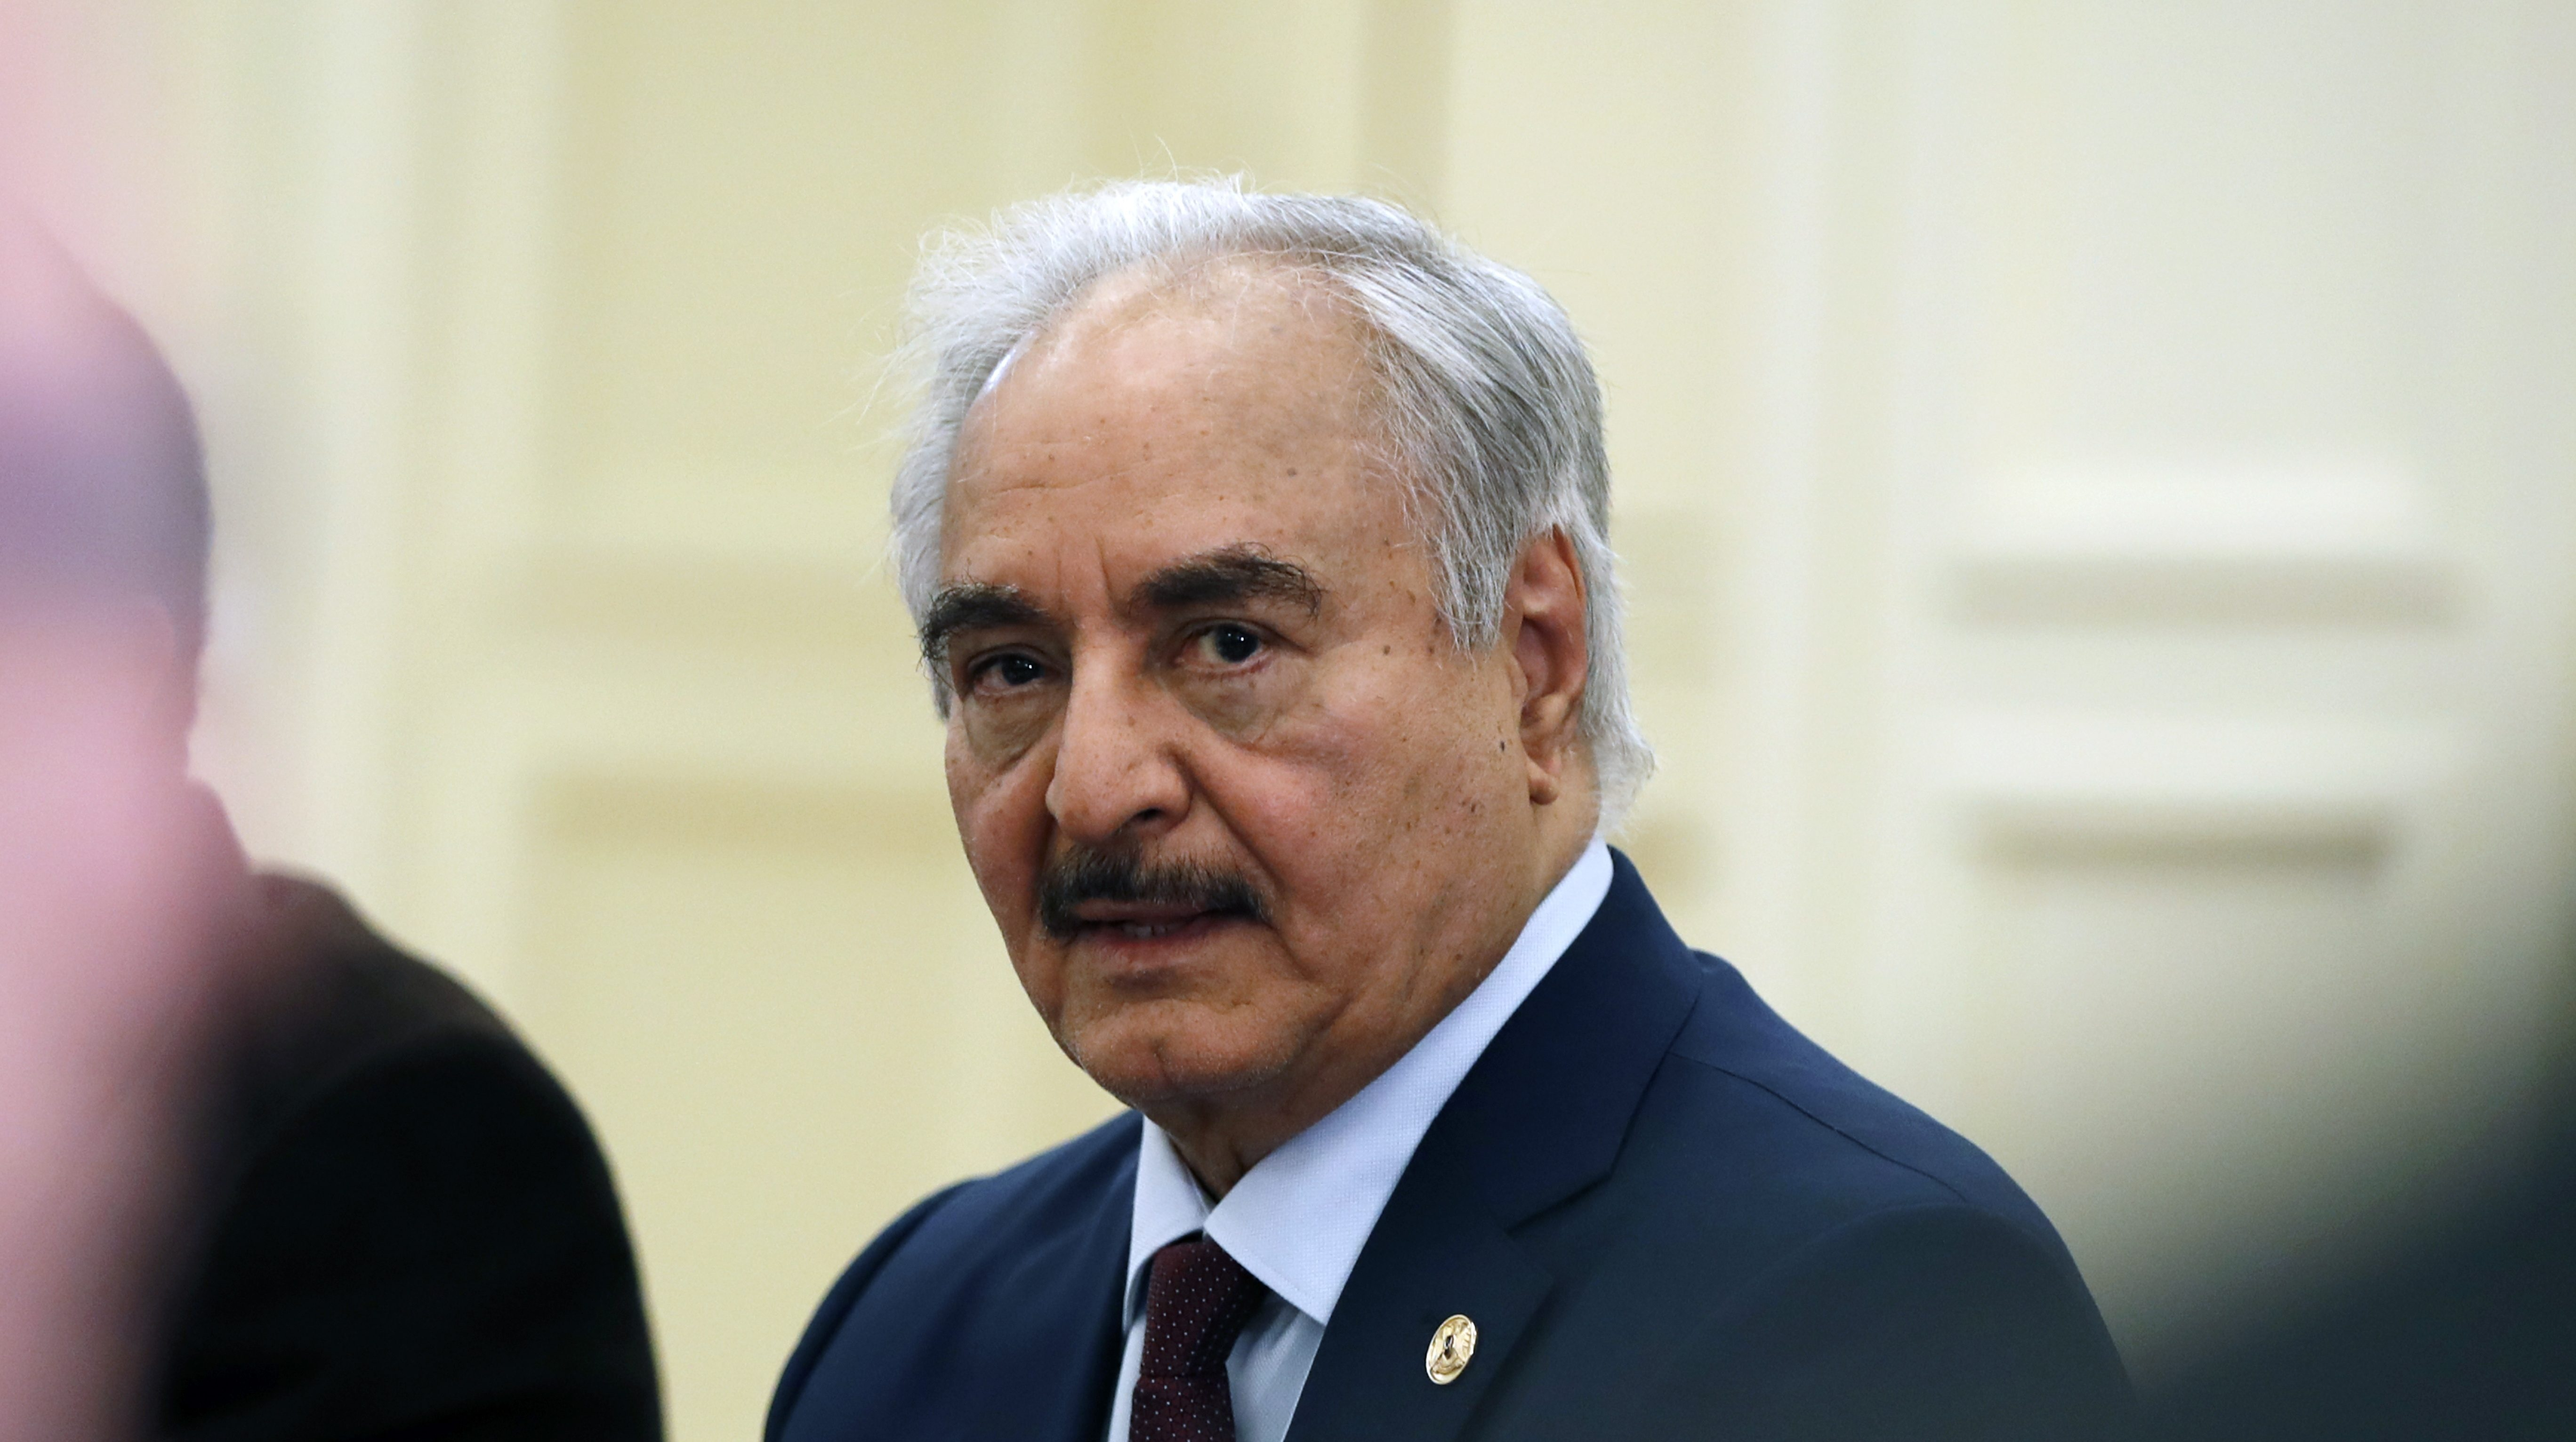 Libia, Haftar riprova a sequestrare i pescherecci italiani